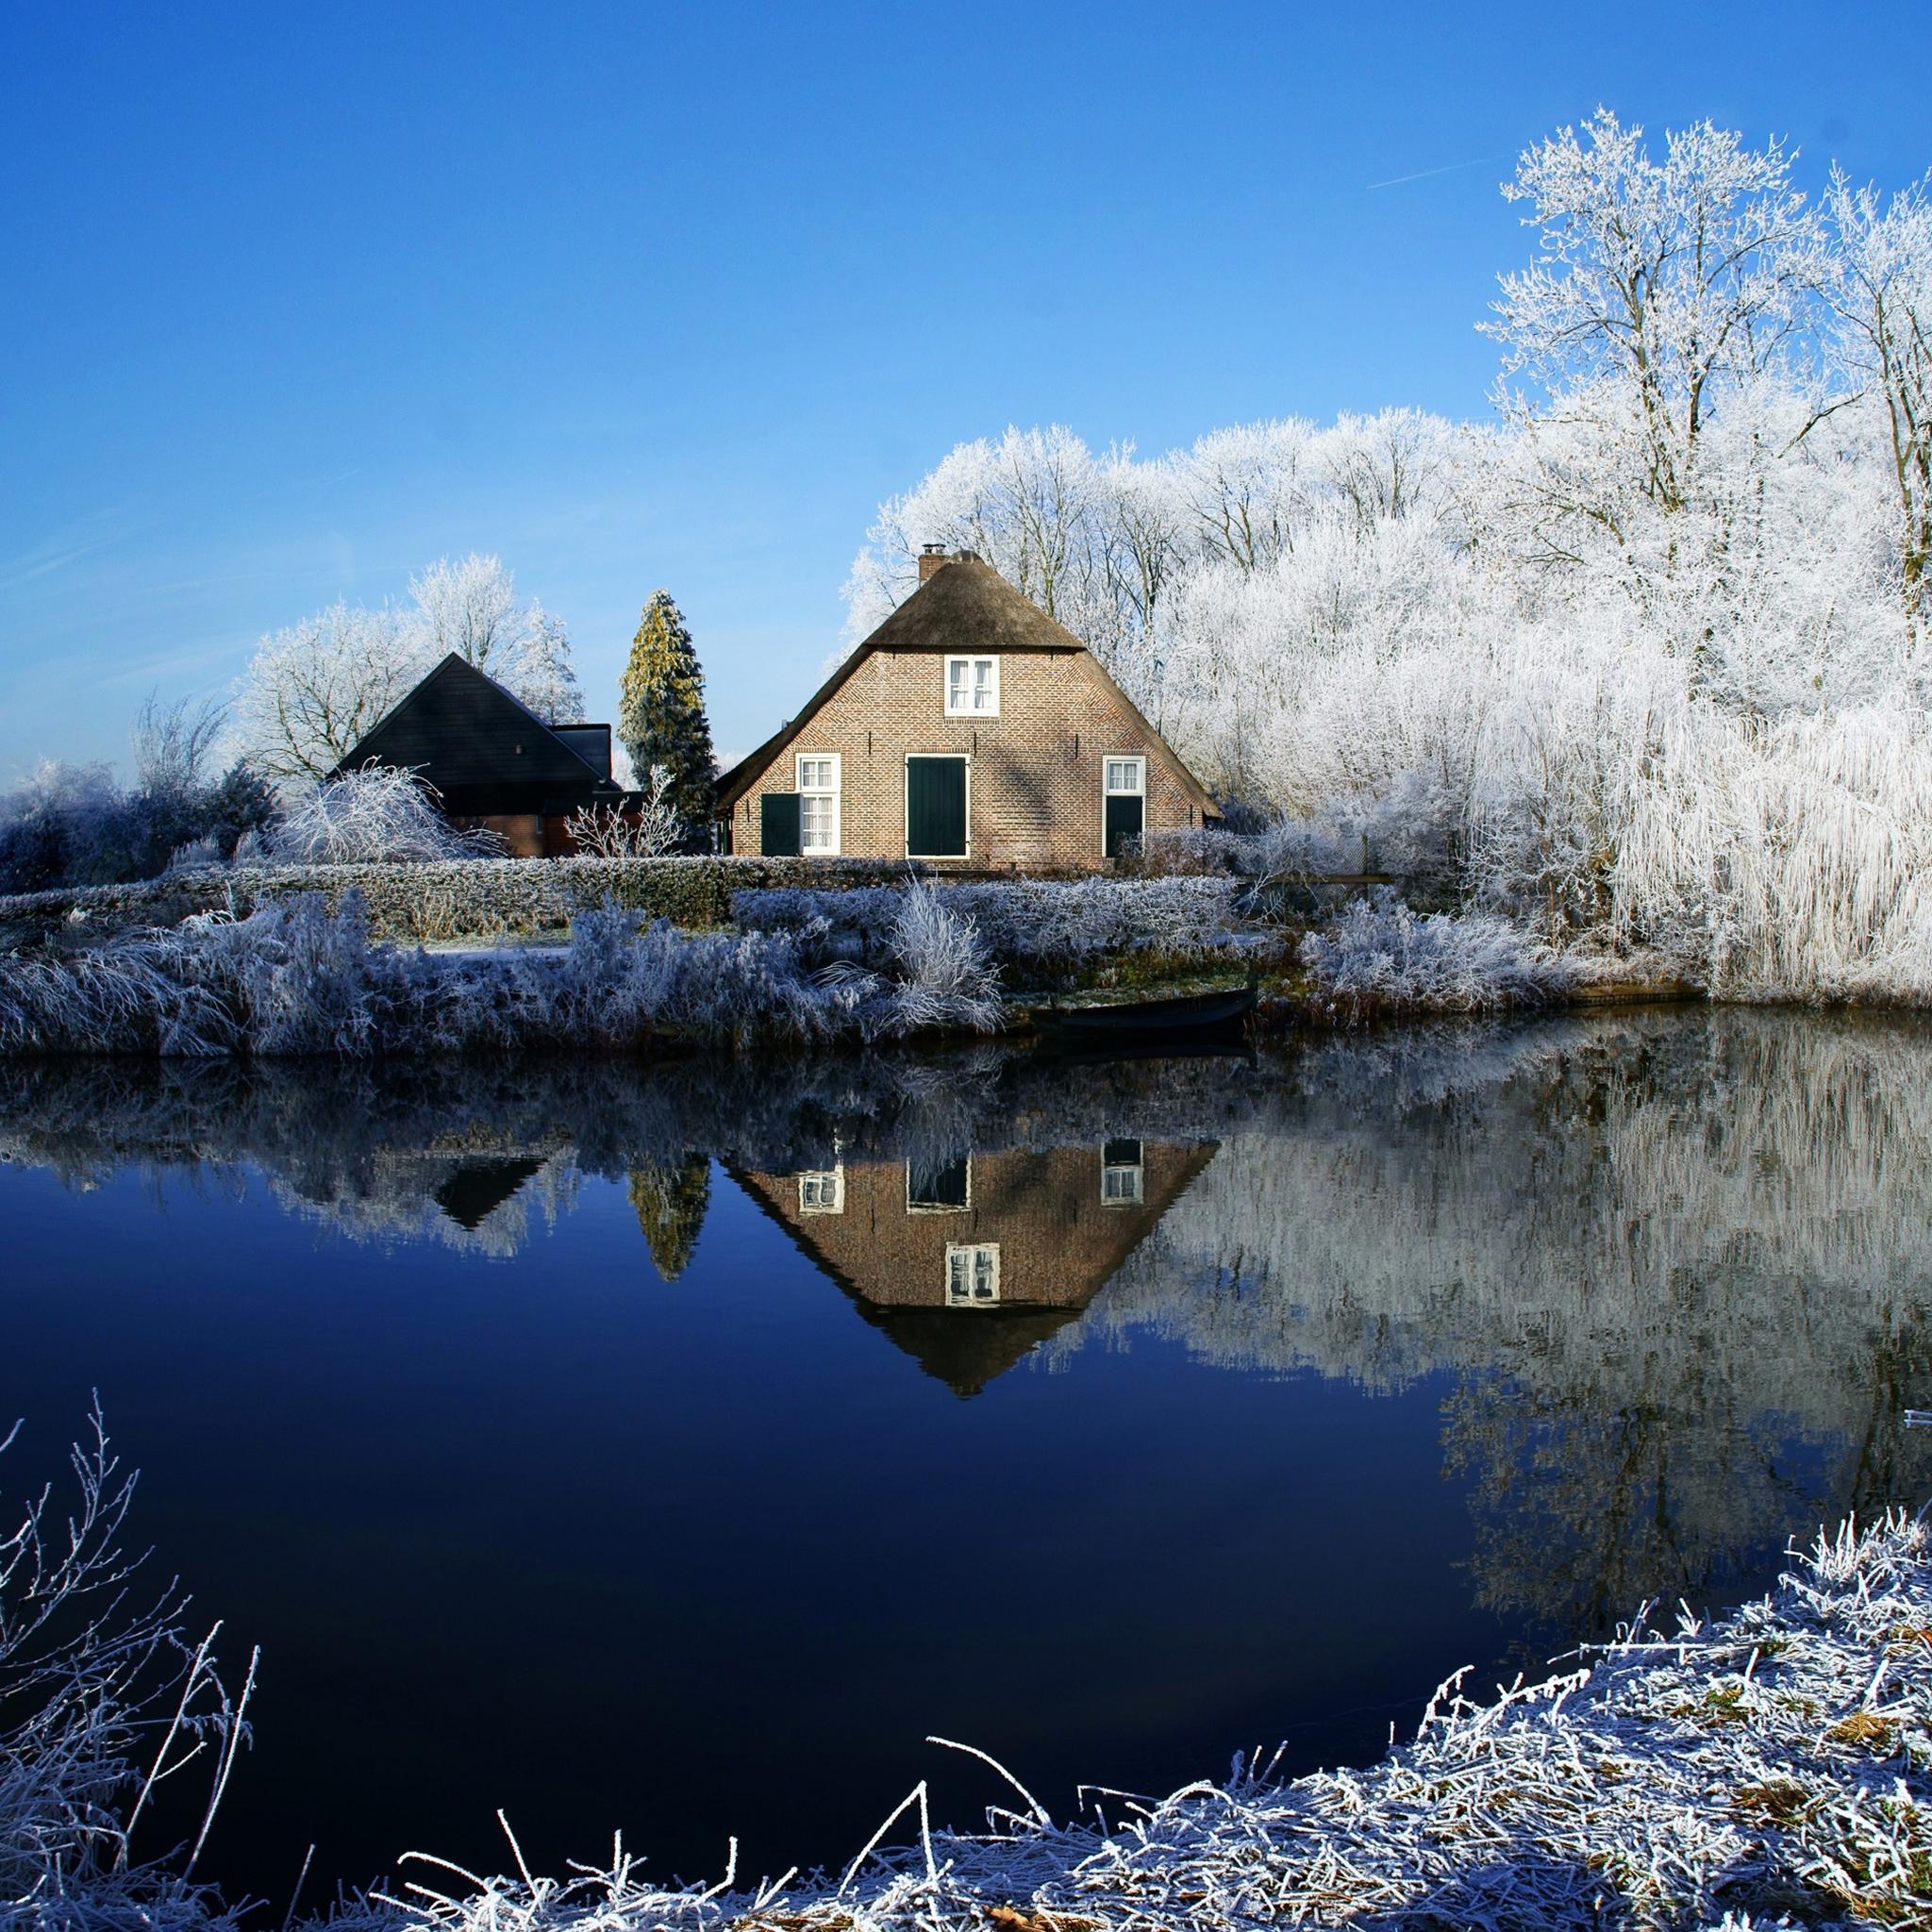 Winter-3Wallpapers-iPad-Retina